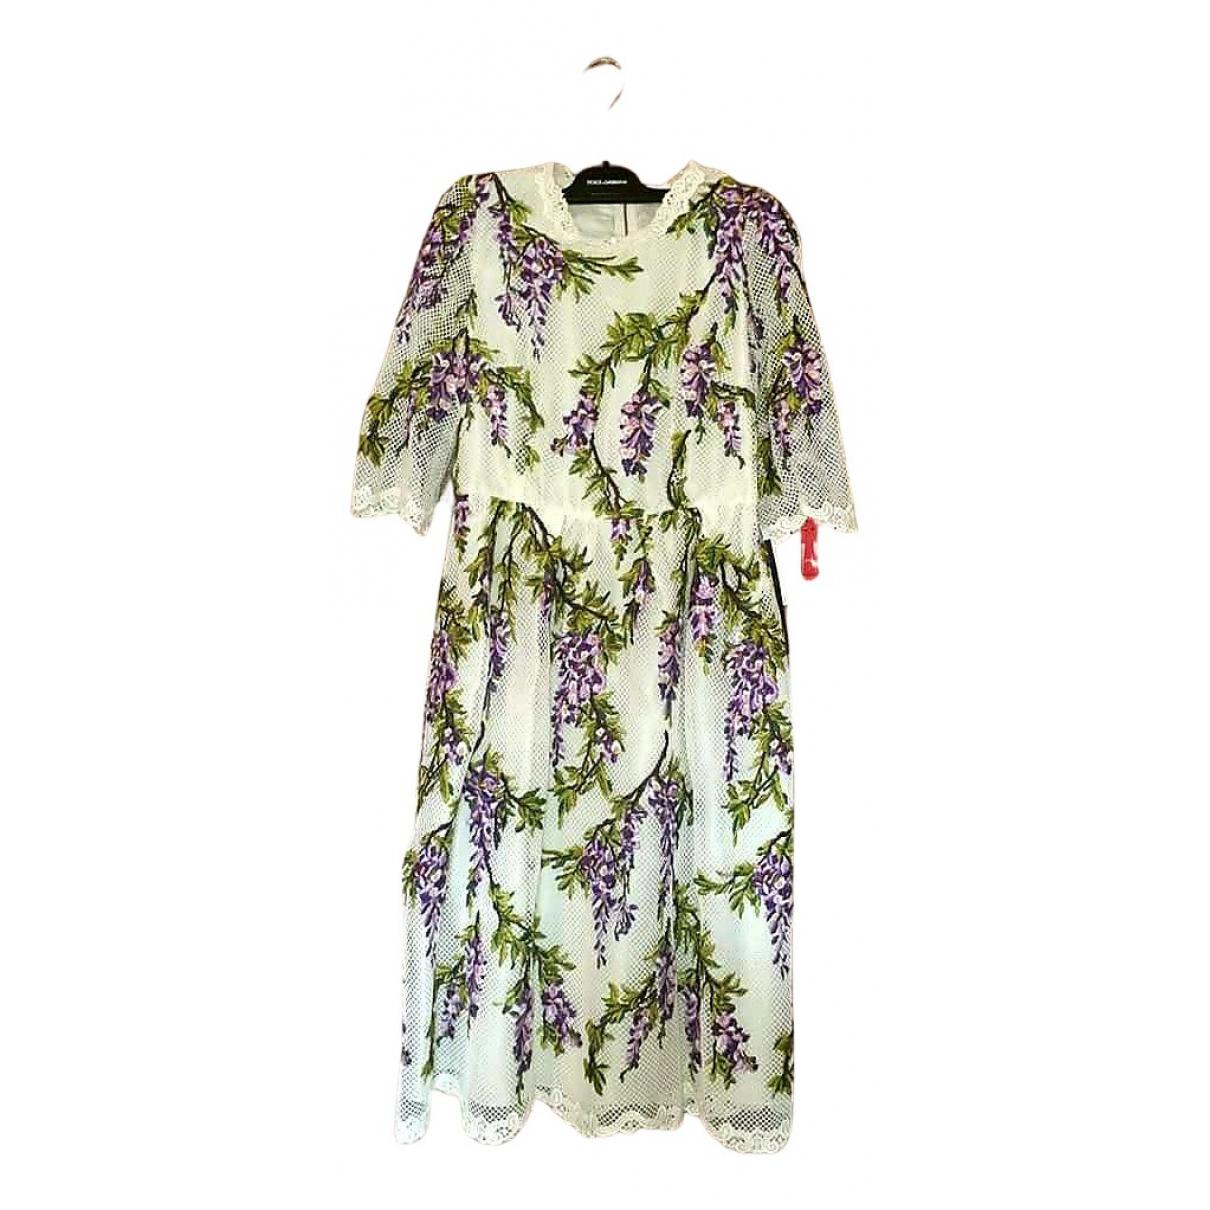 Dolce & Gabbana \N Black Cotton dress for Women 38 IT